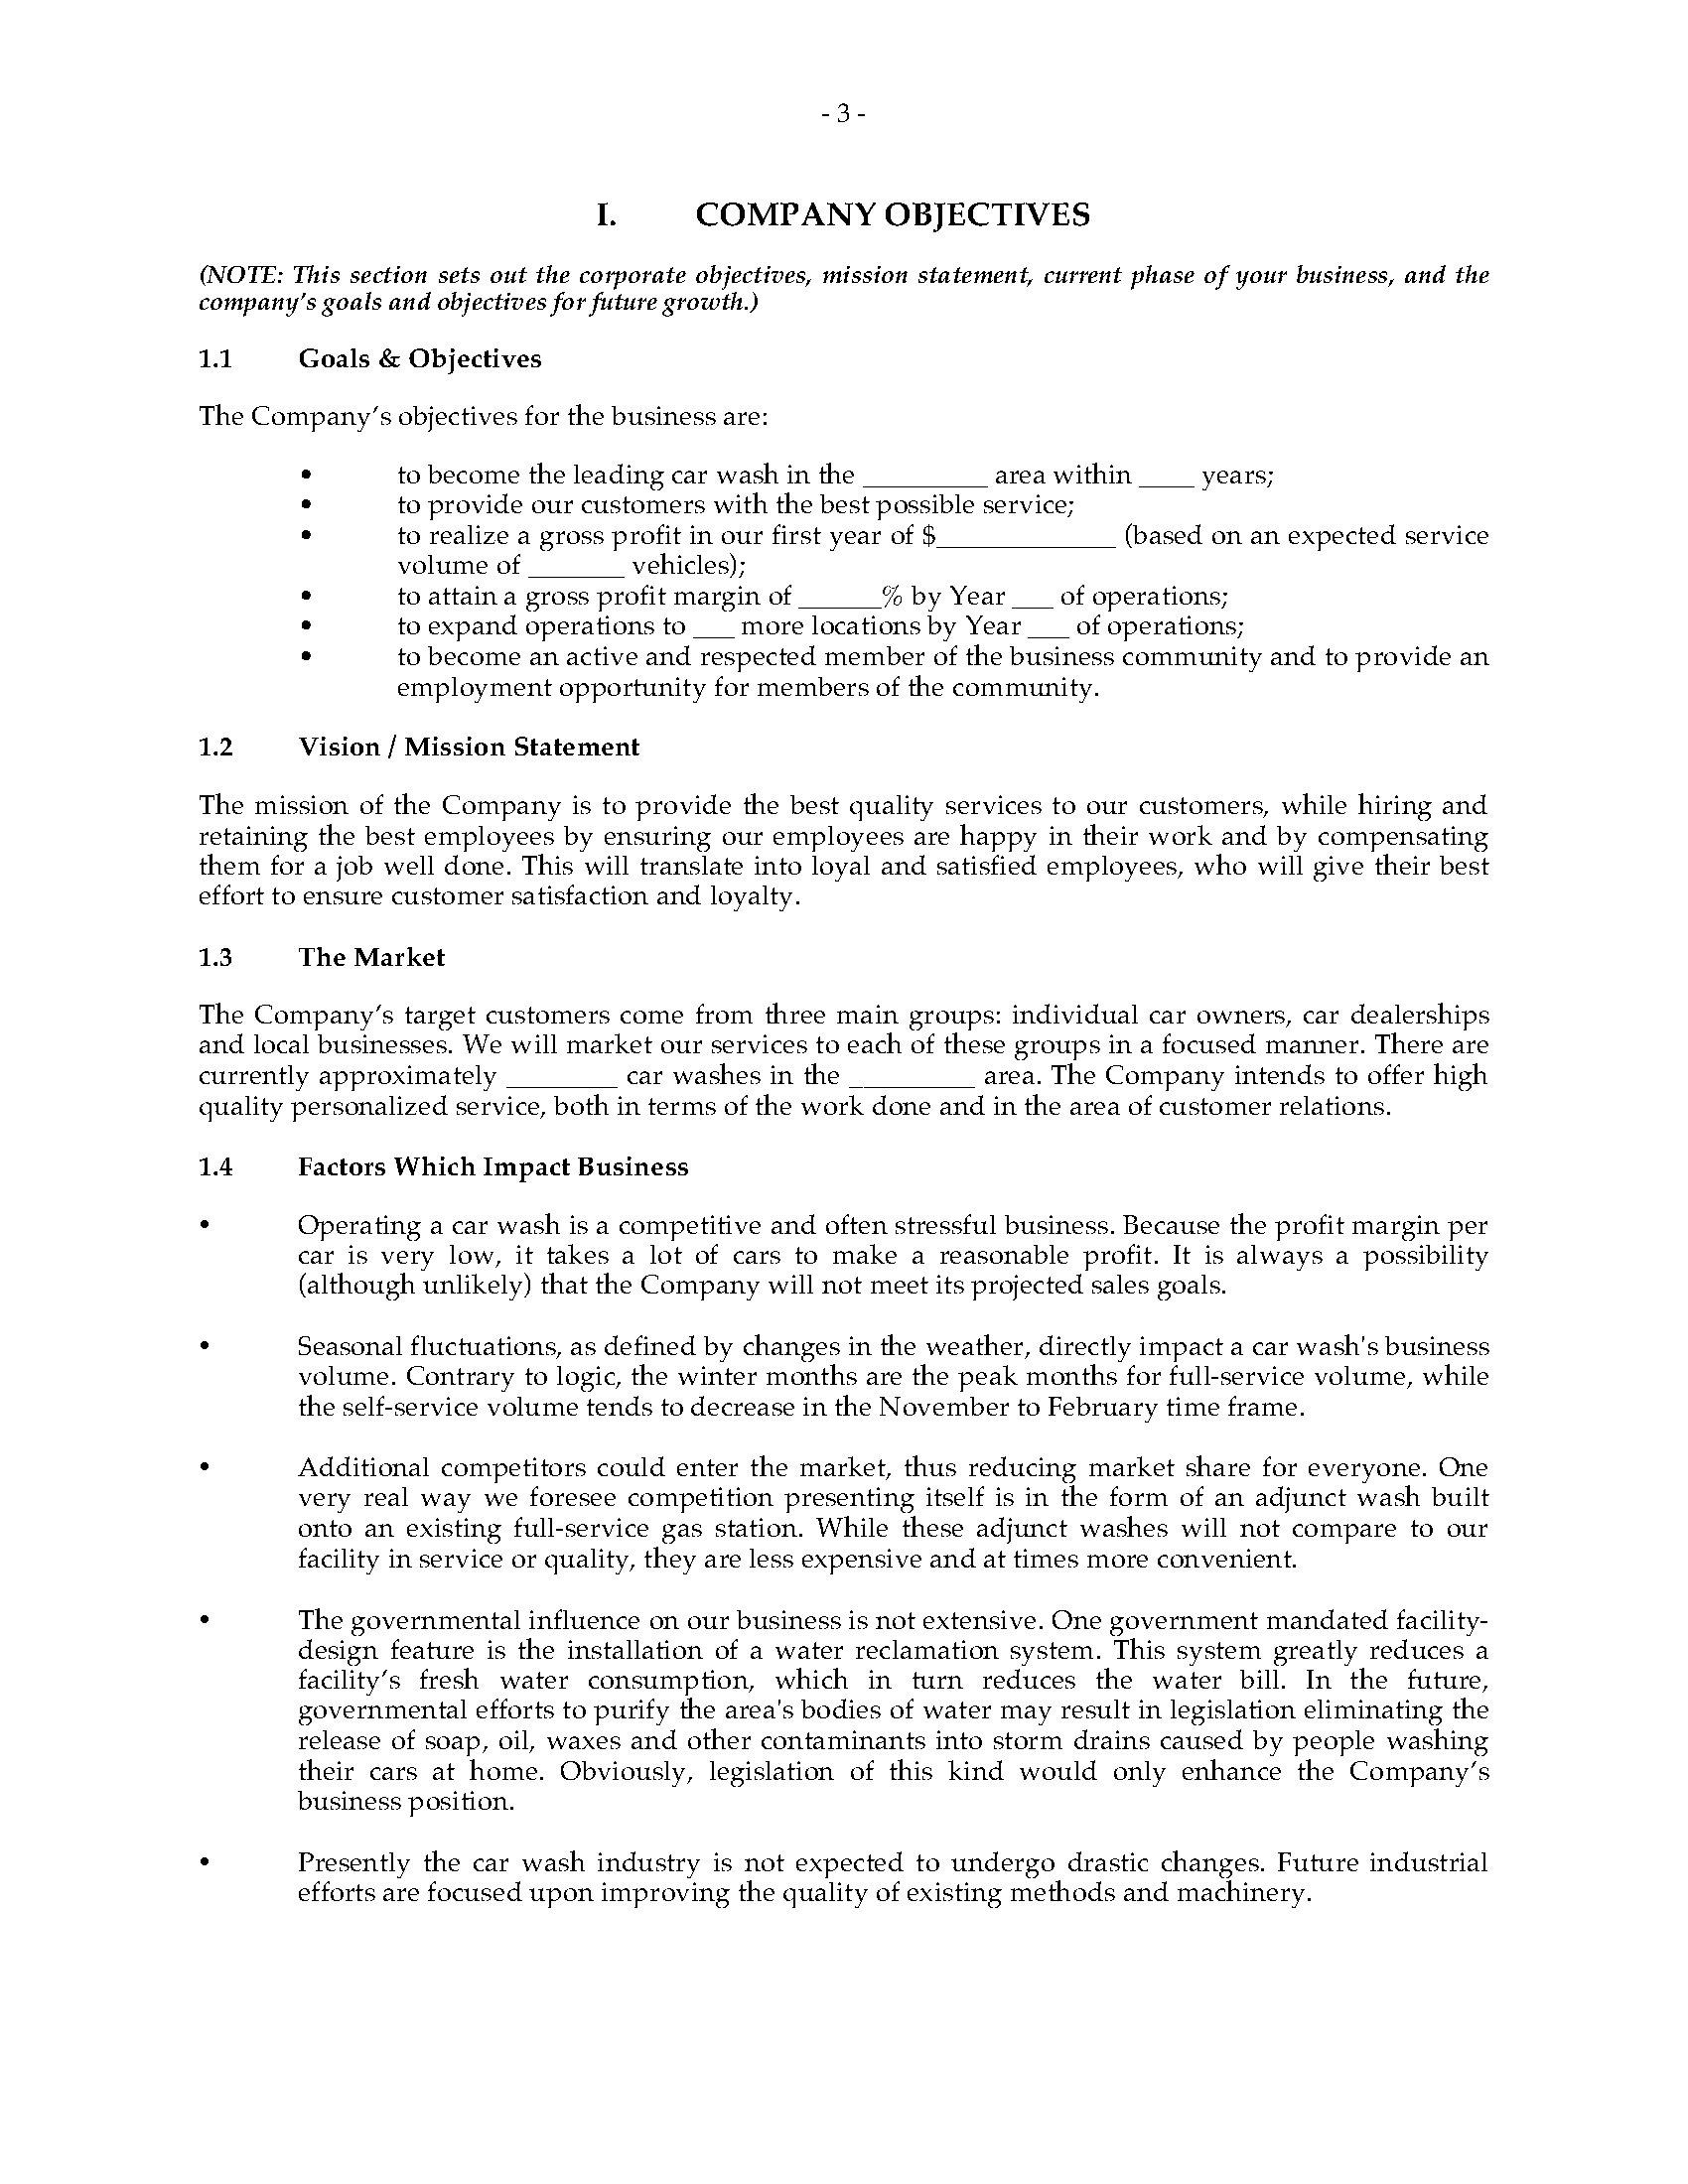 car wash business mission statement